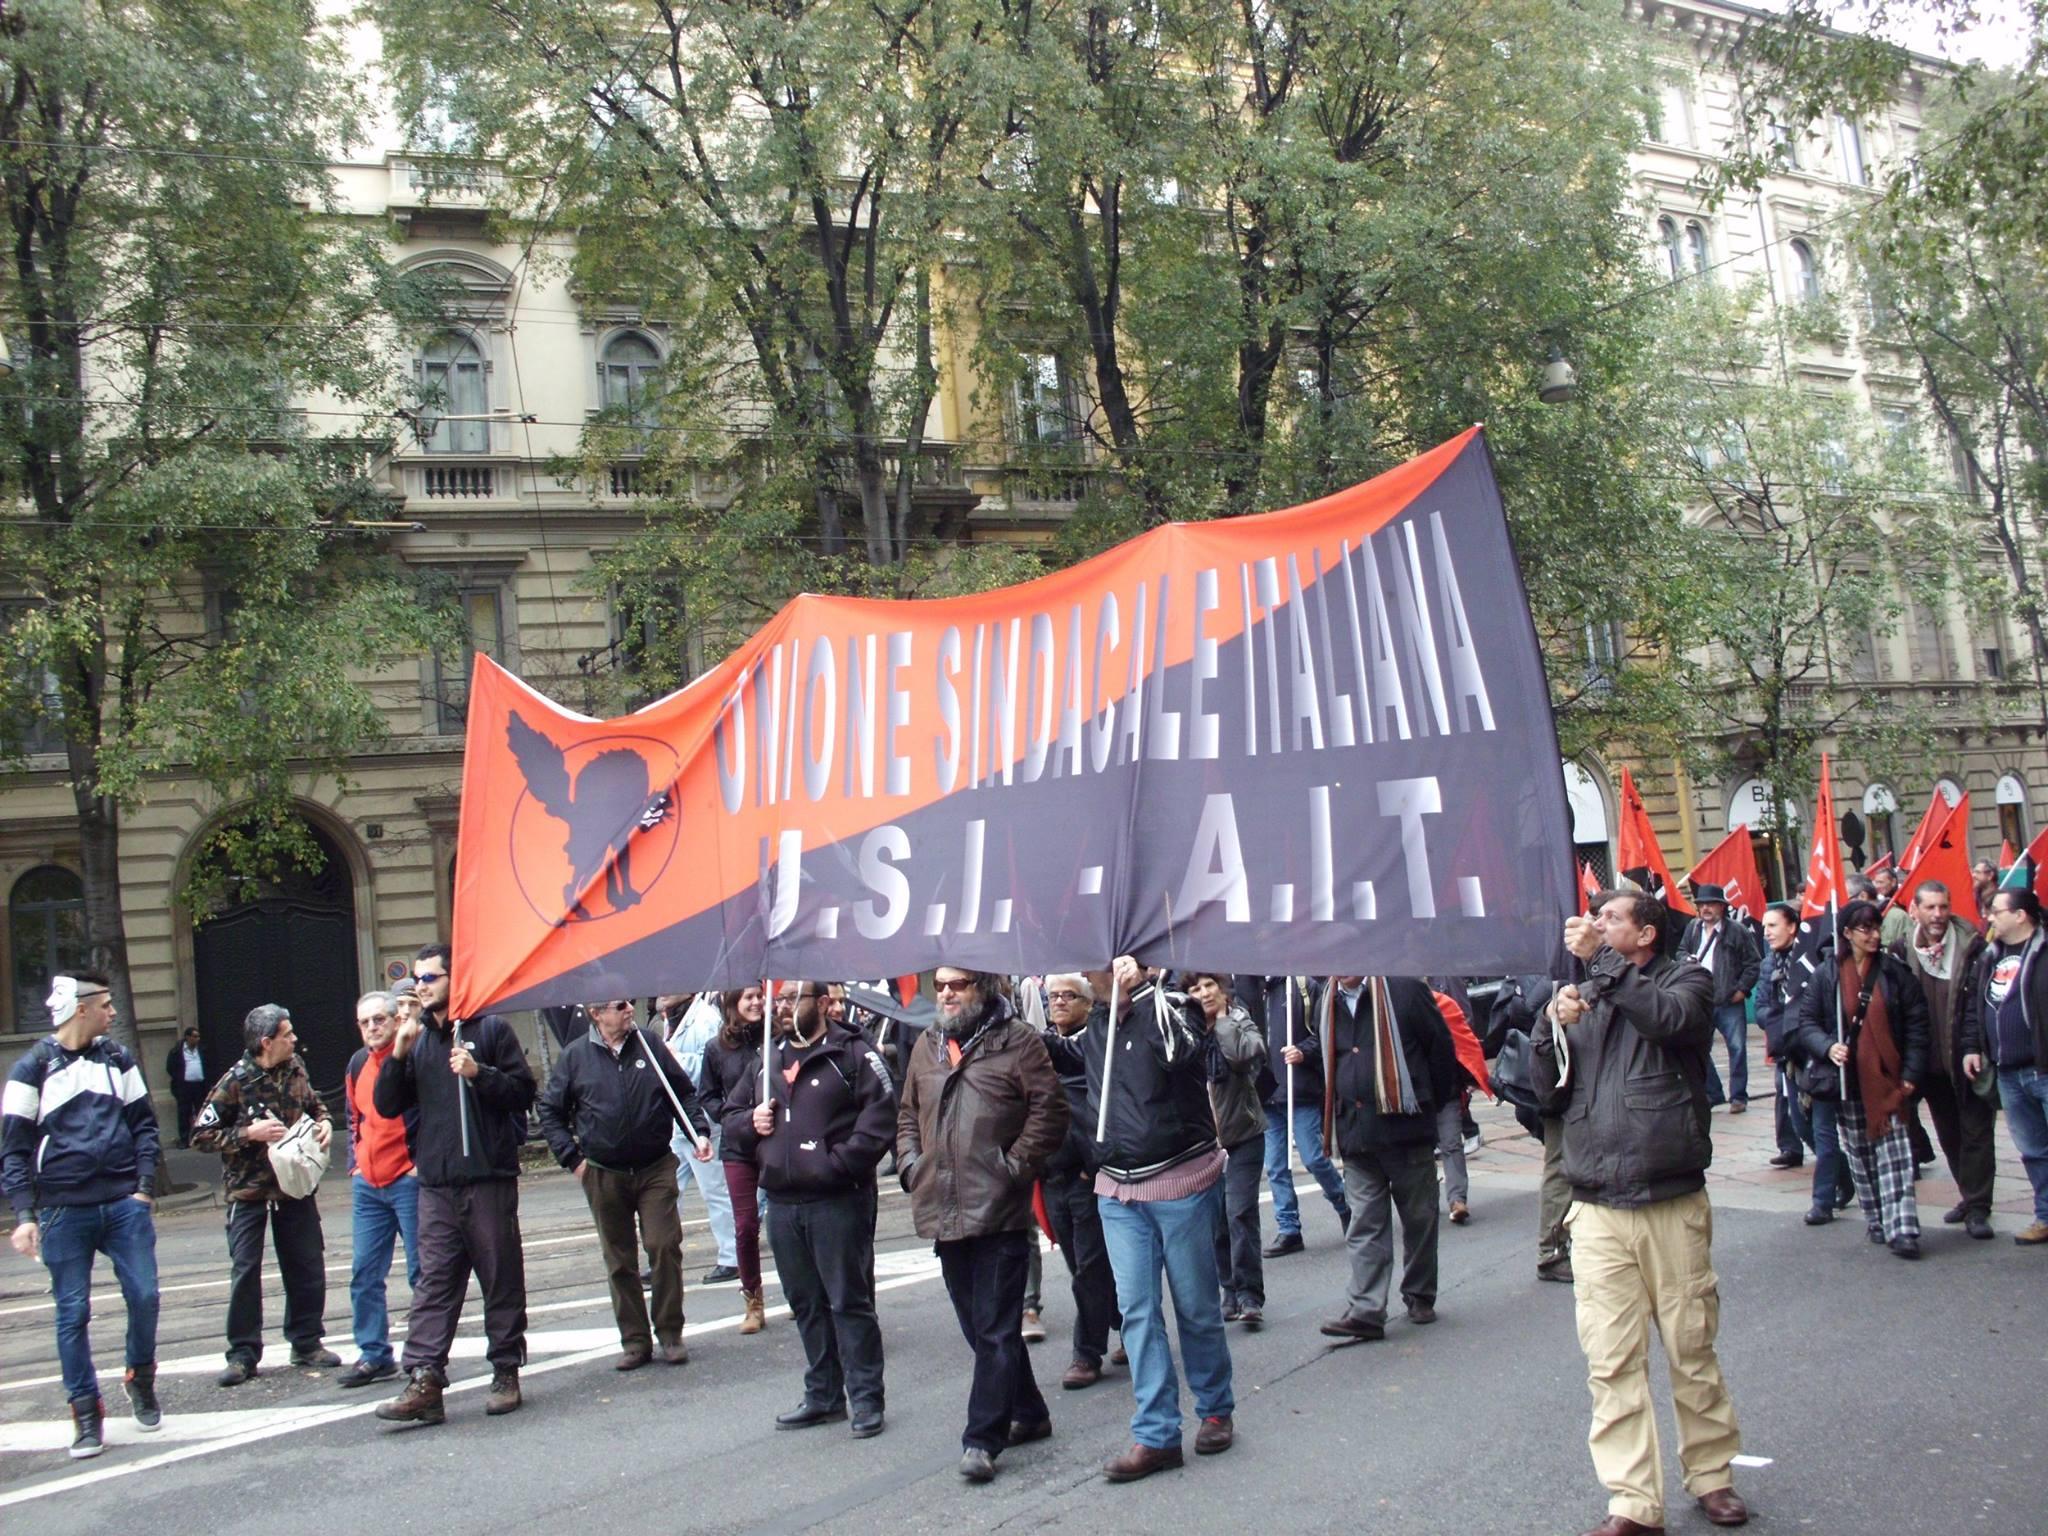 USI-IAA Mailand #14N